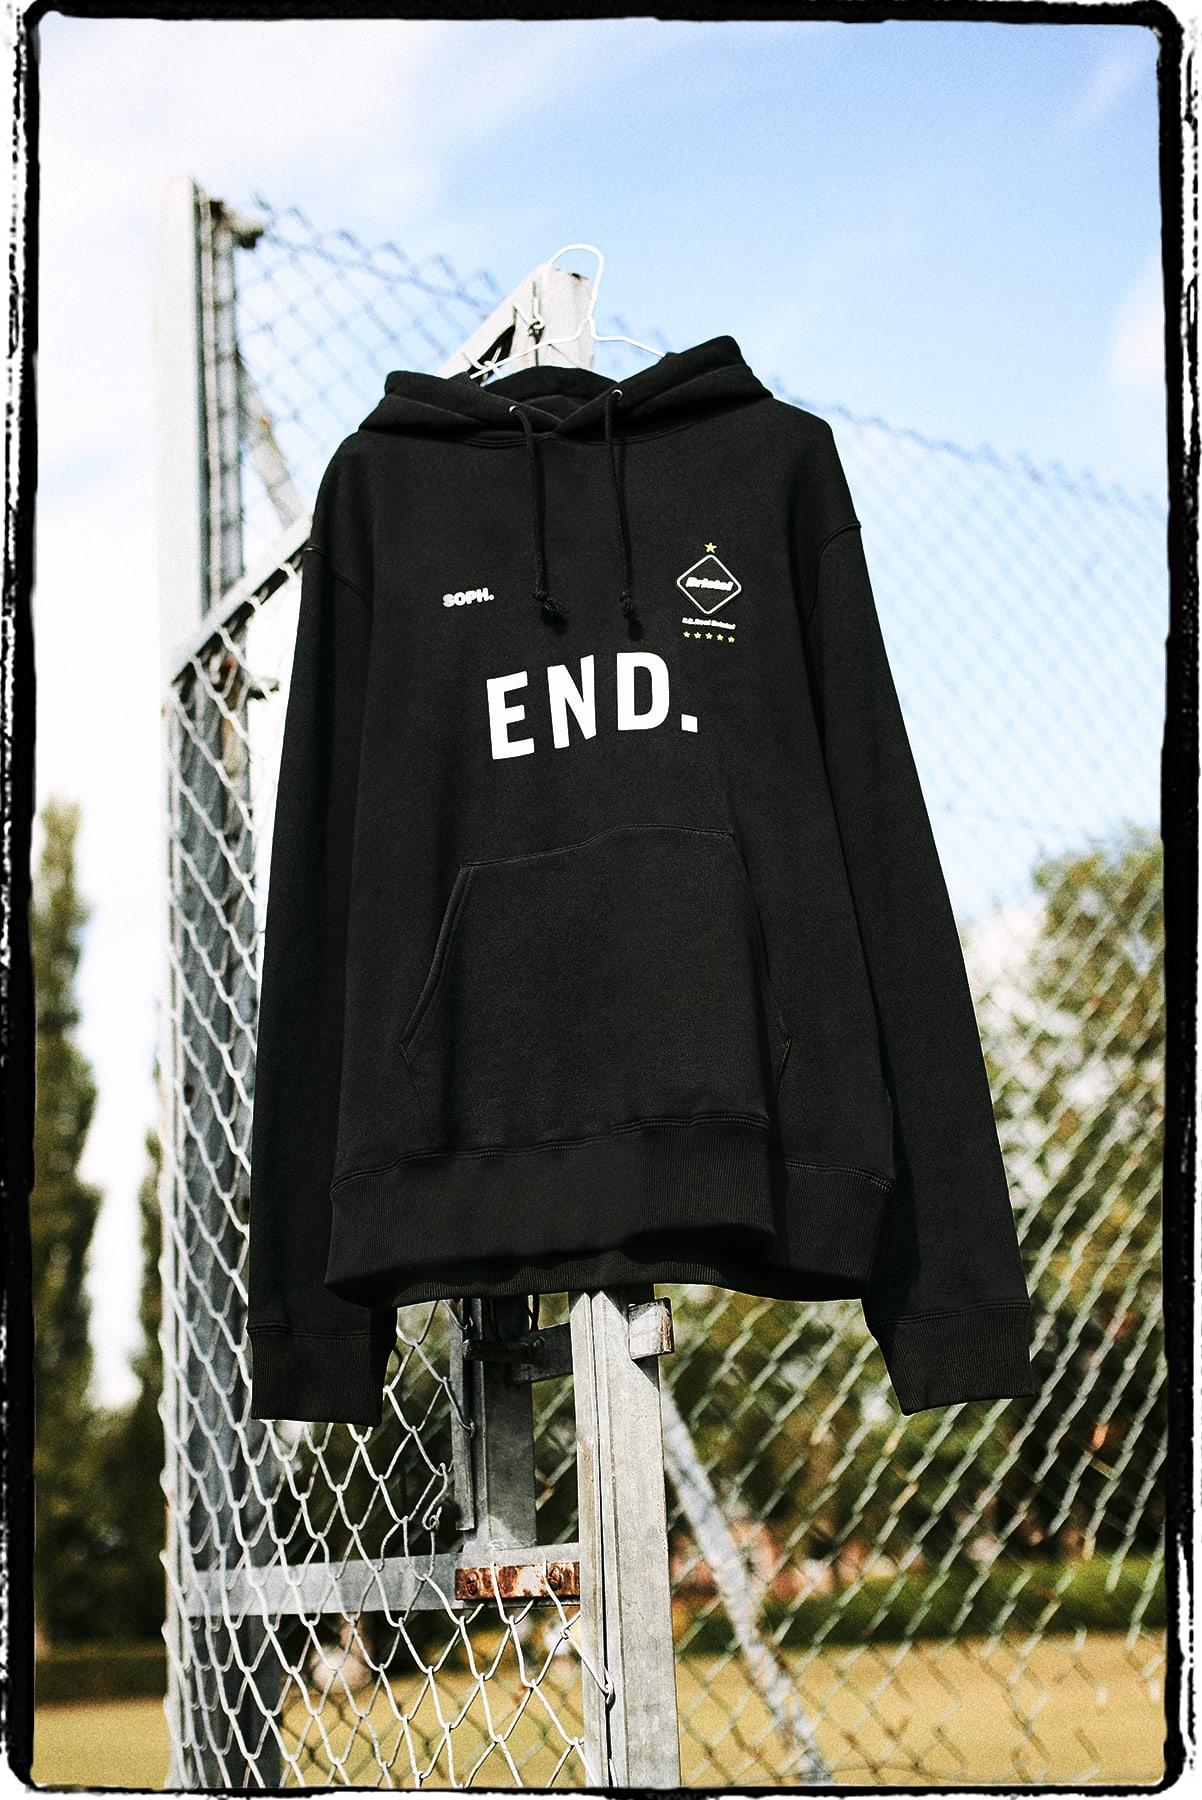 END. x F.C. Real Bristol 15th Anniversary Capsule